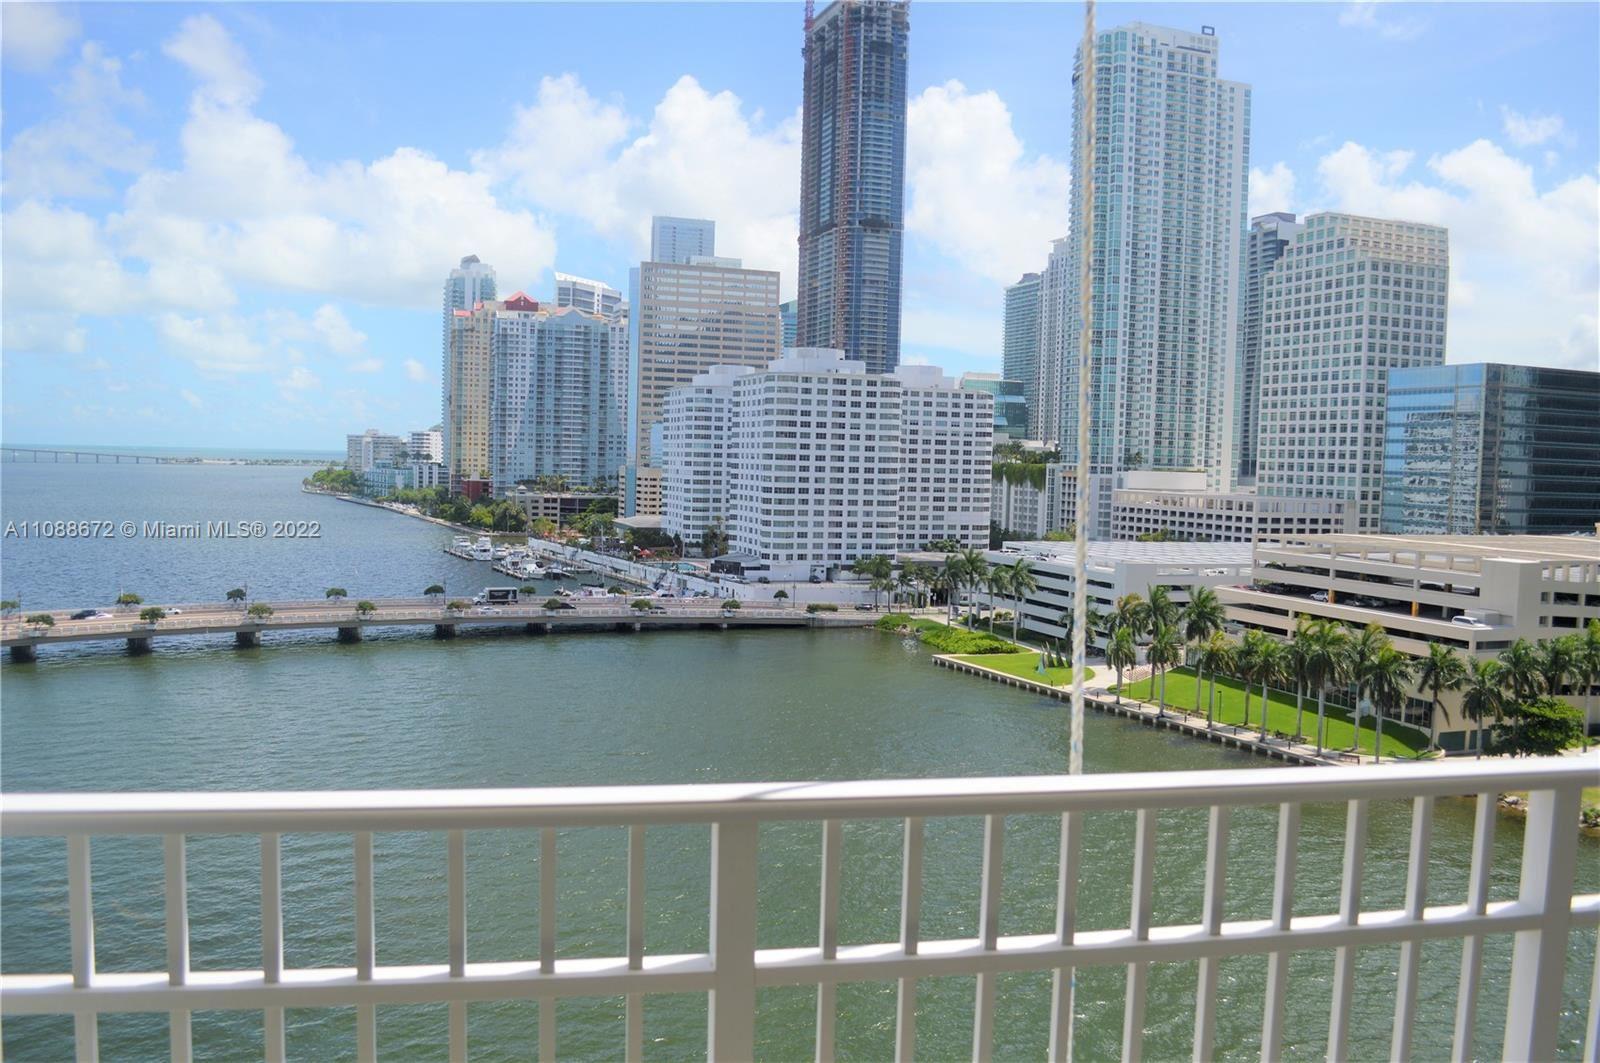 701 Brickell Key Blvd #1203, Miami, FL 33131 - #: A11088672